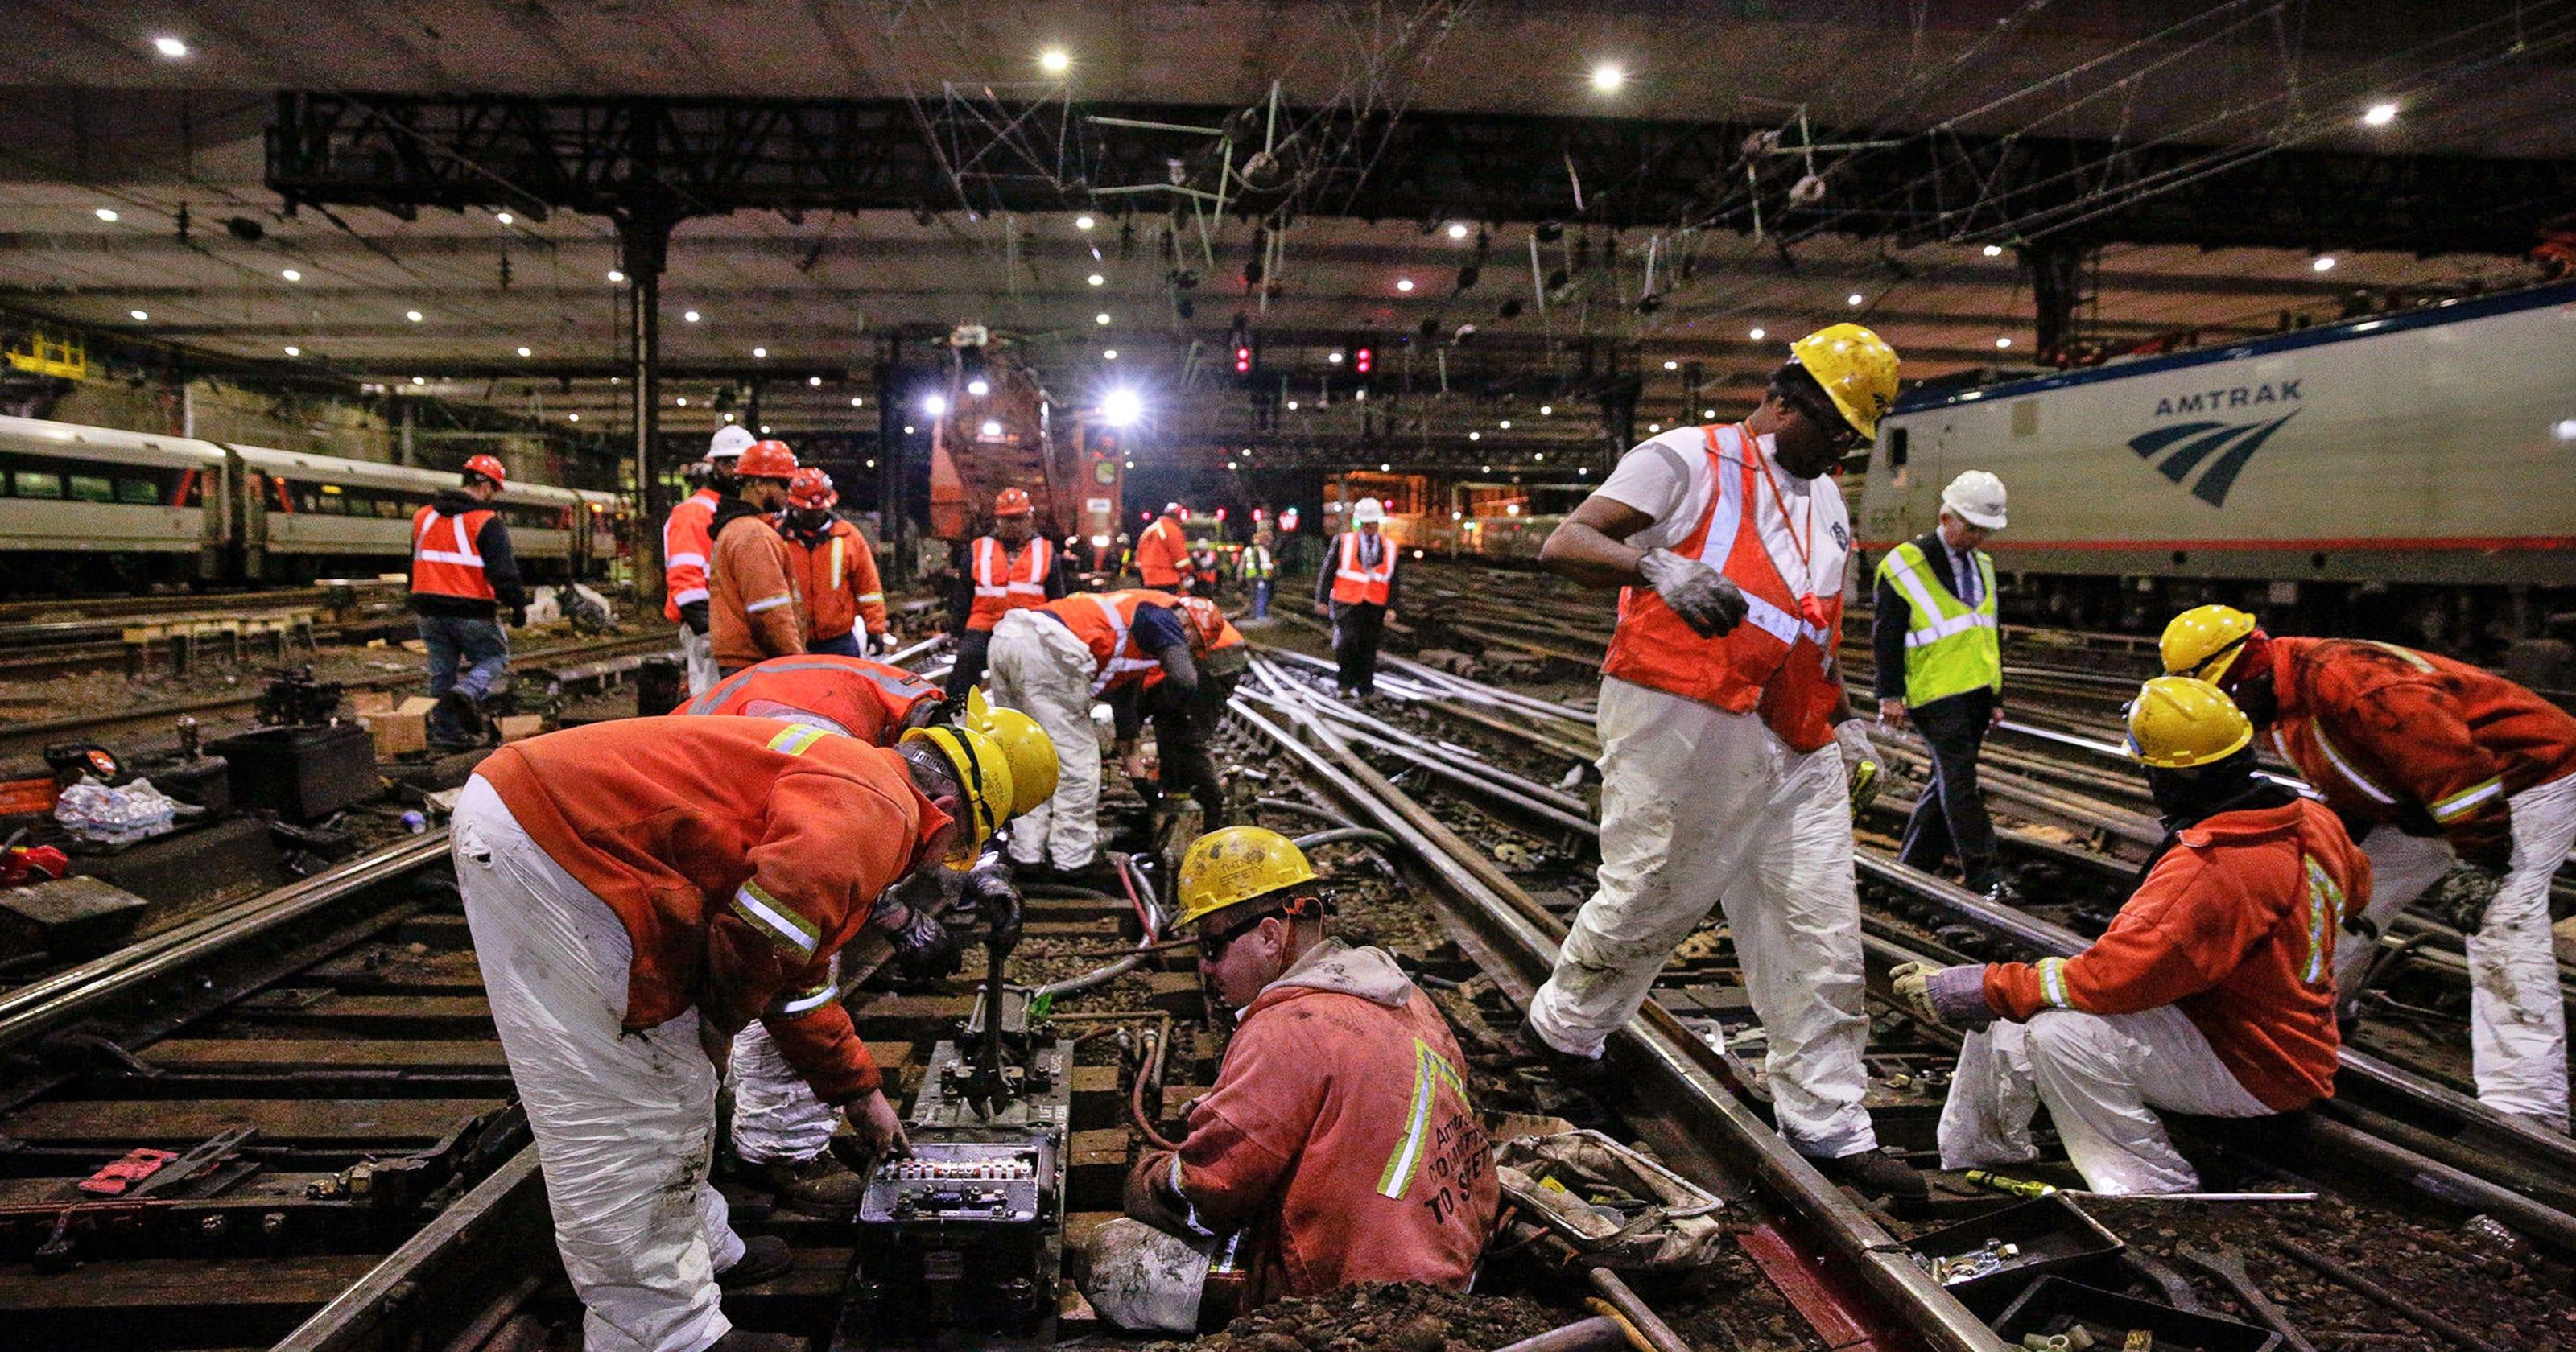 NJ Transit to divert some Penn Station trains to Hoboken